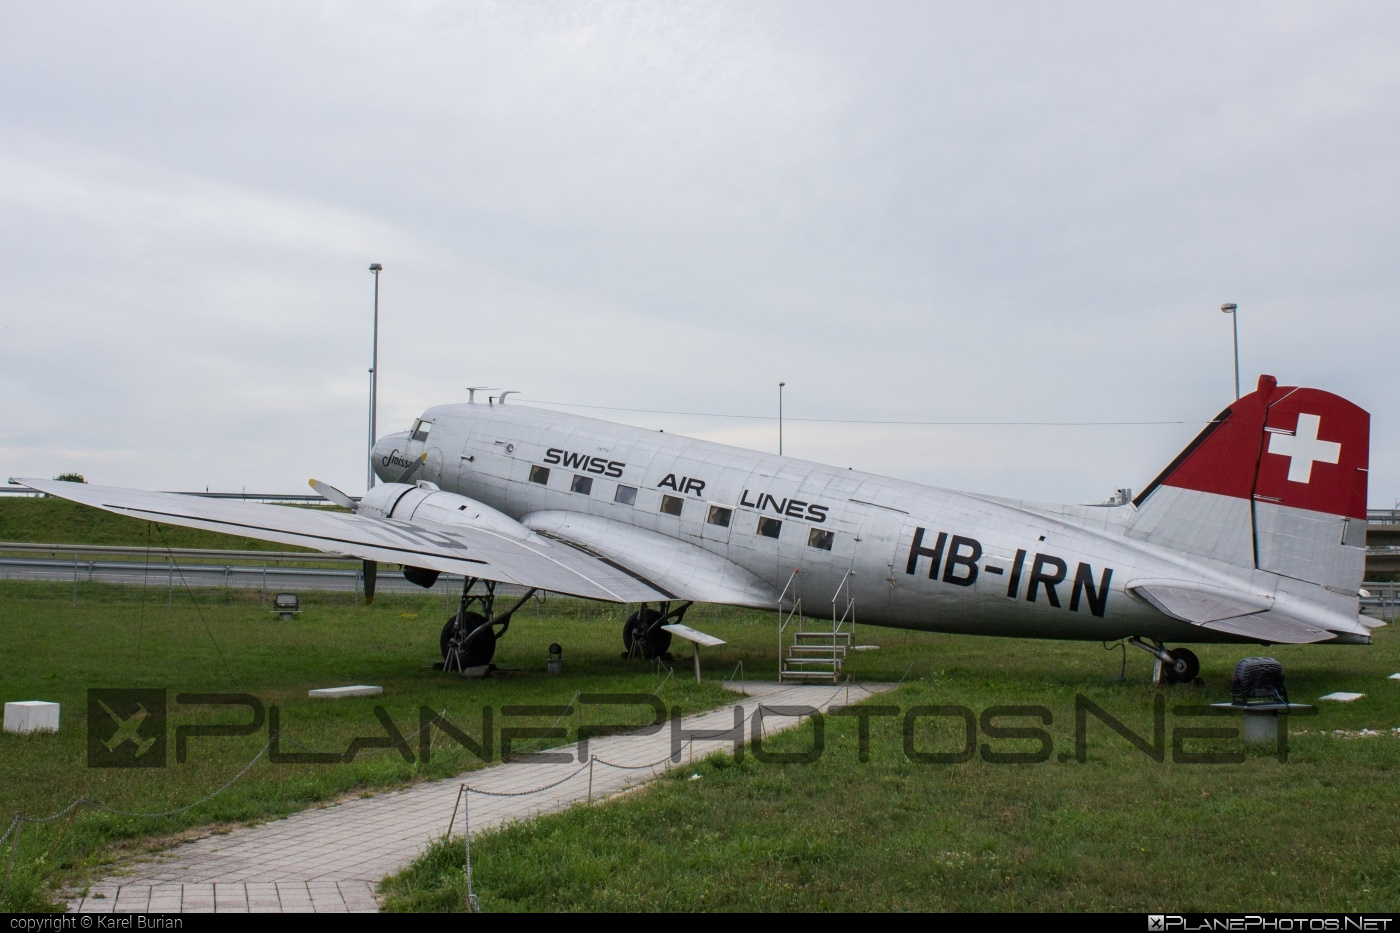 Douglas C-47 Skytrain - HB-IRN operated by Swissair #c47 #dc3 #douglas #skytrain #swissair